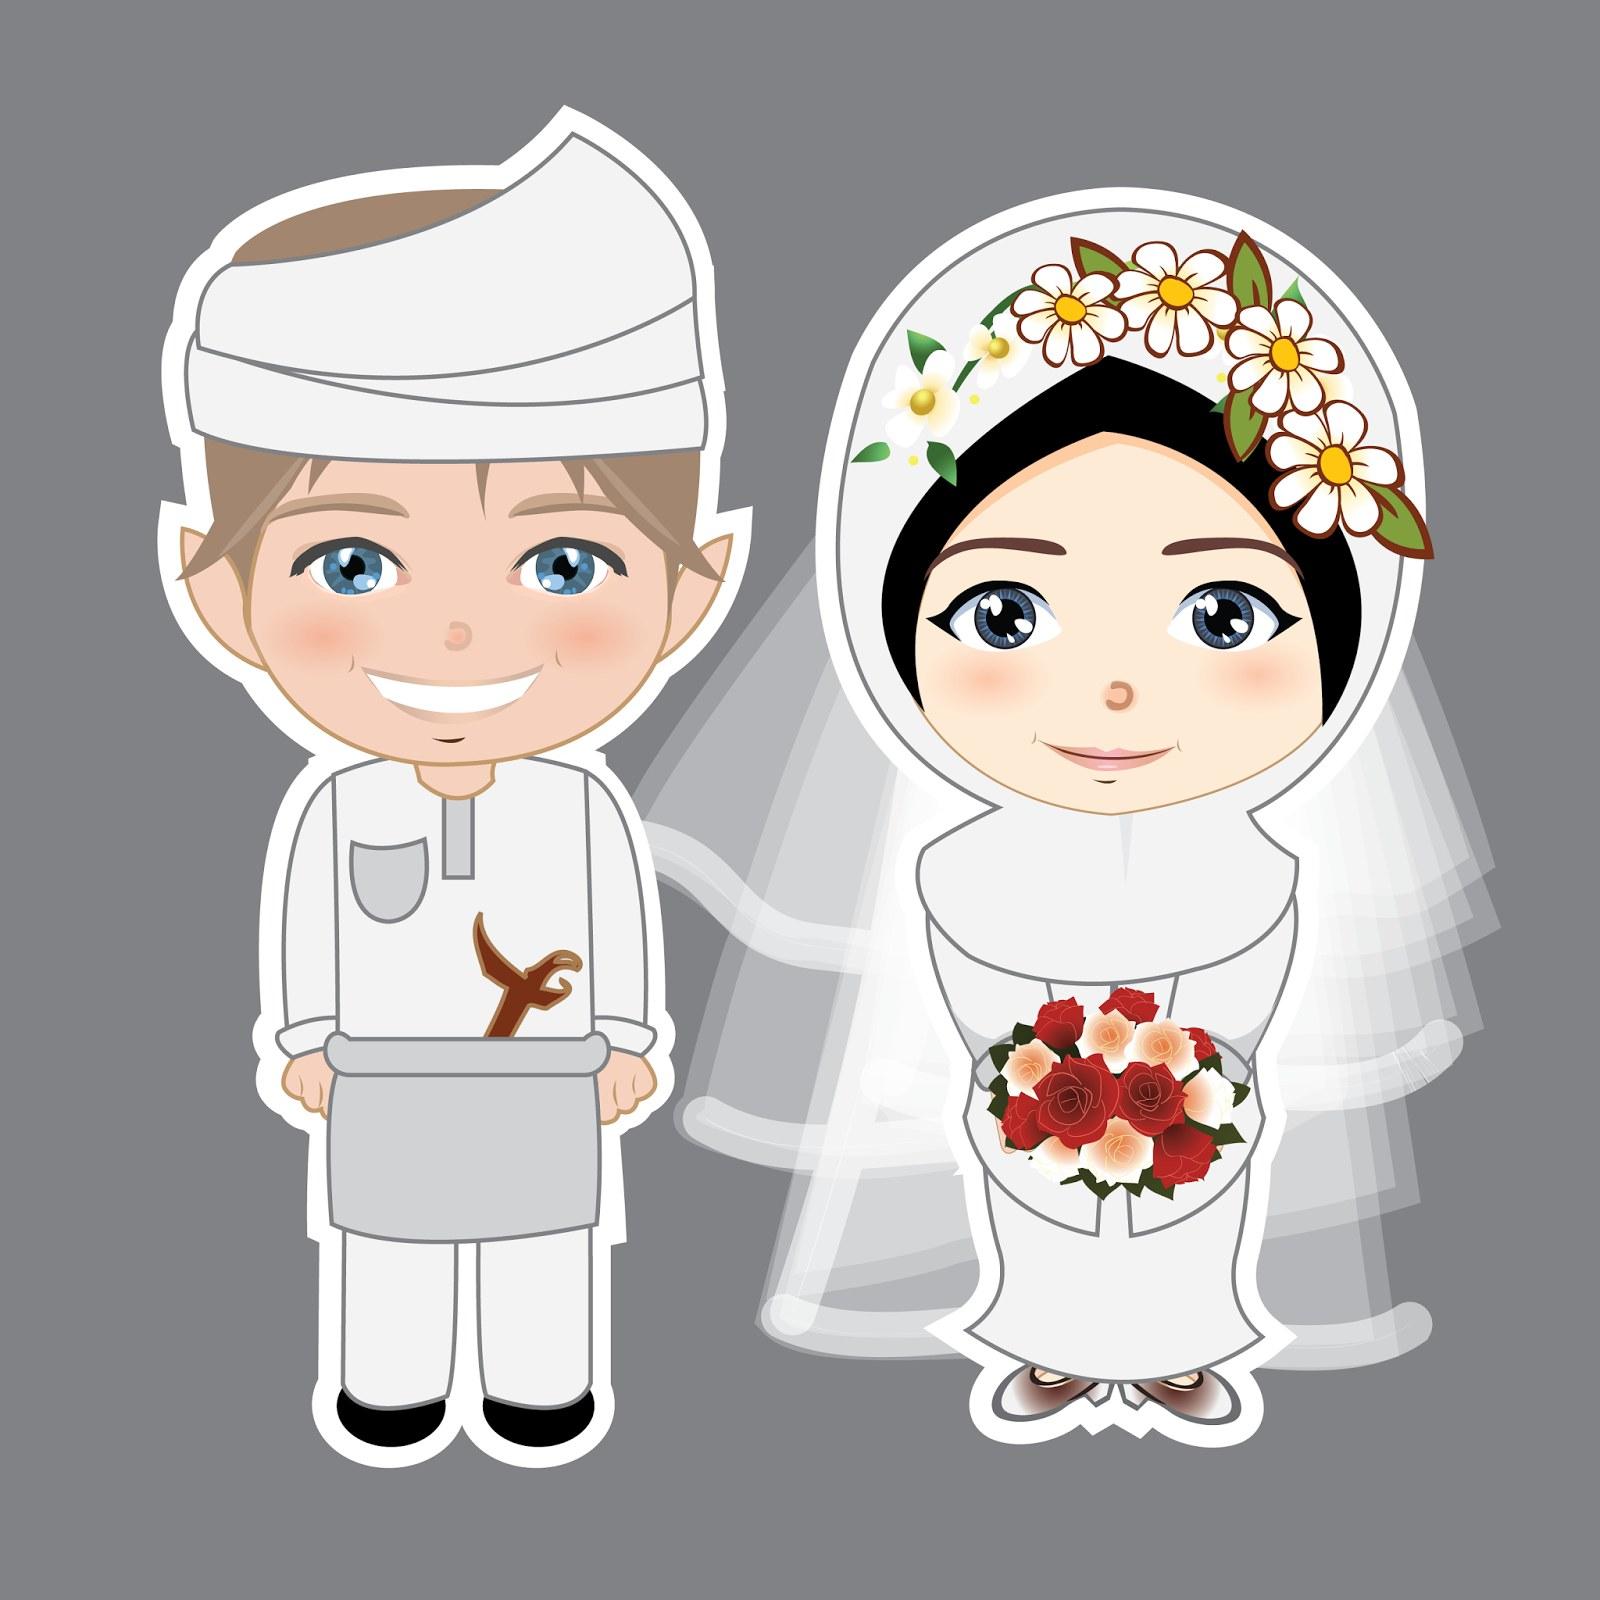 Inspirasi Baju Pengantin Muslim Syari Drdp Kumpulan Animasi Pengantin Muslim